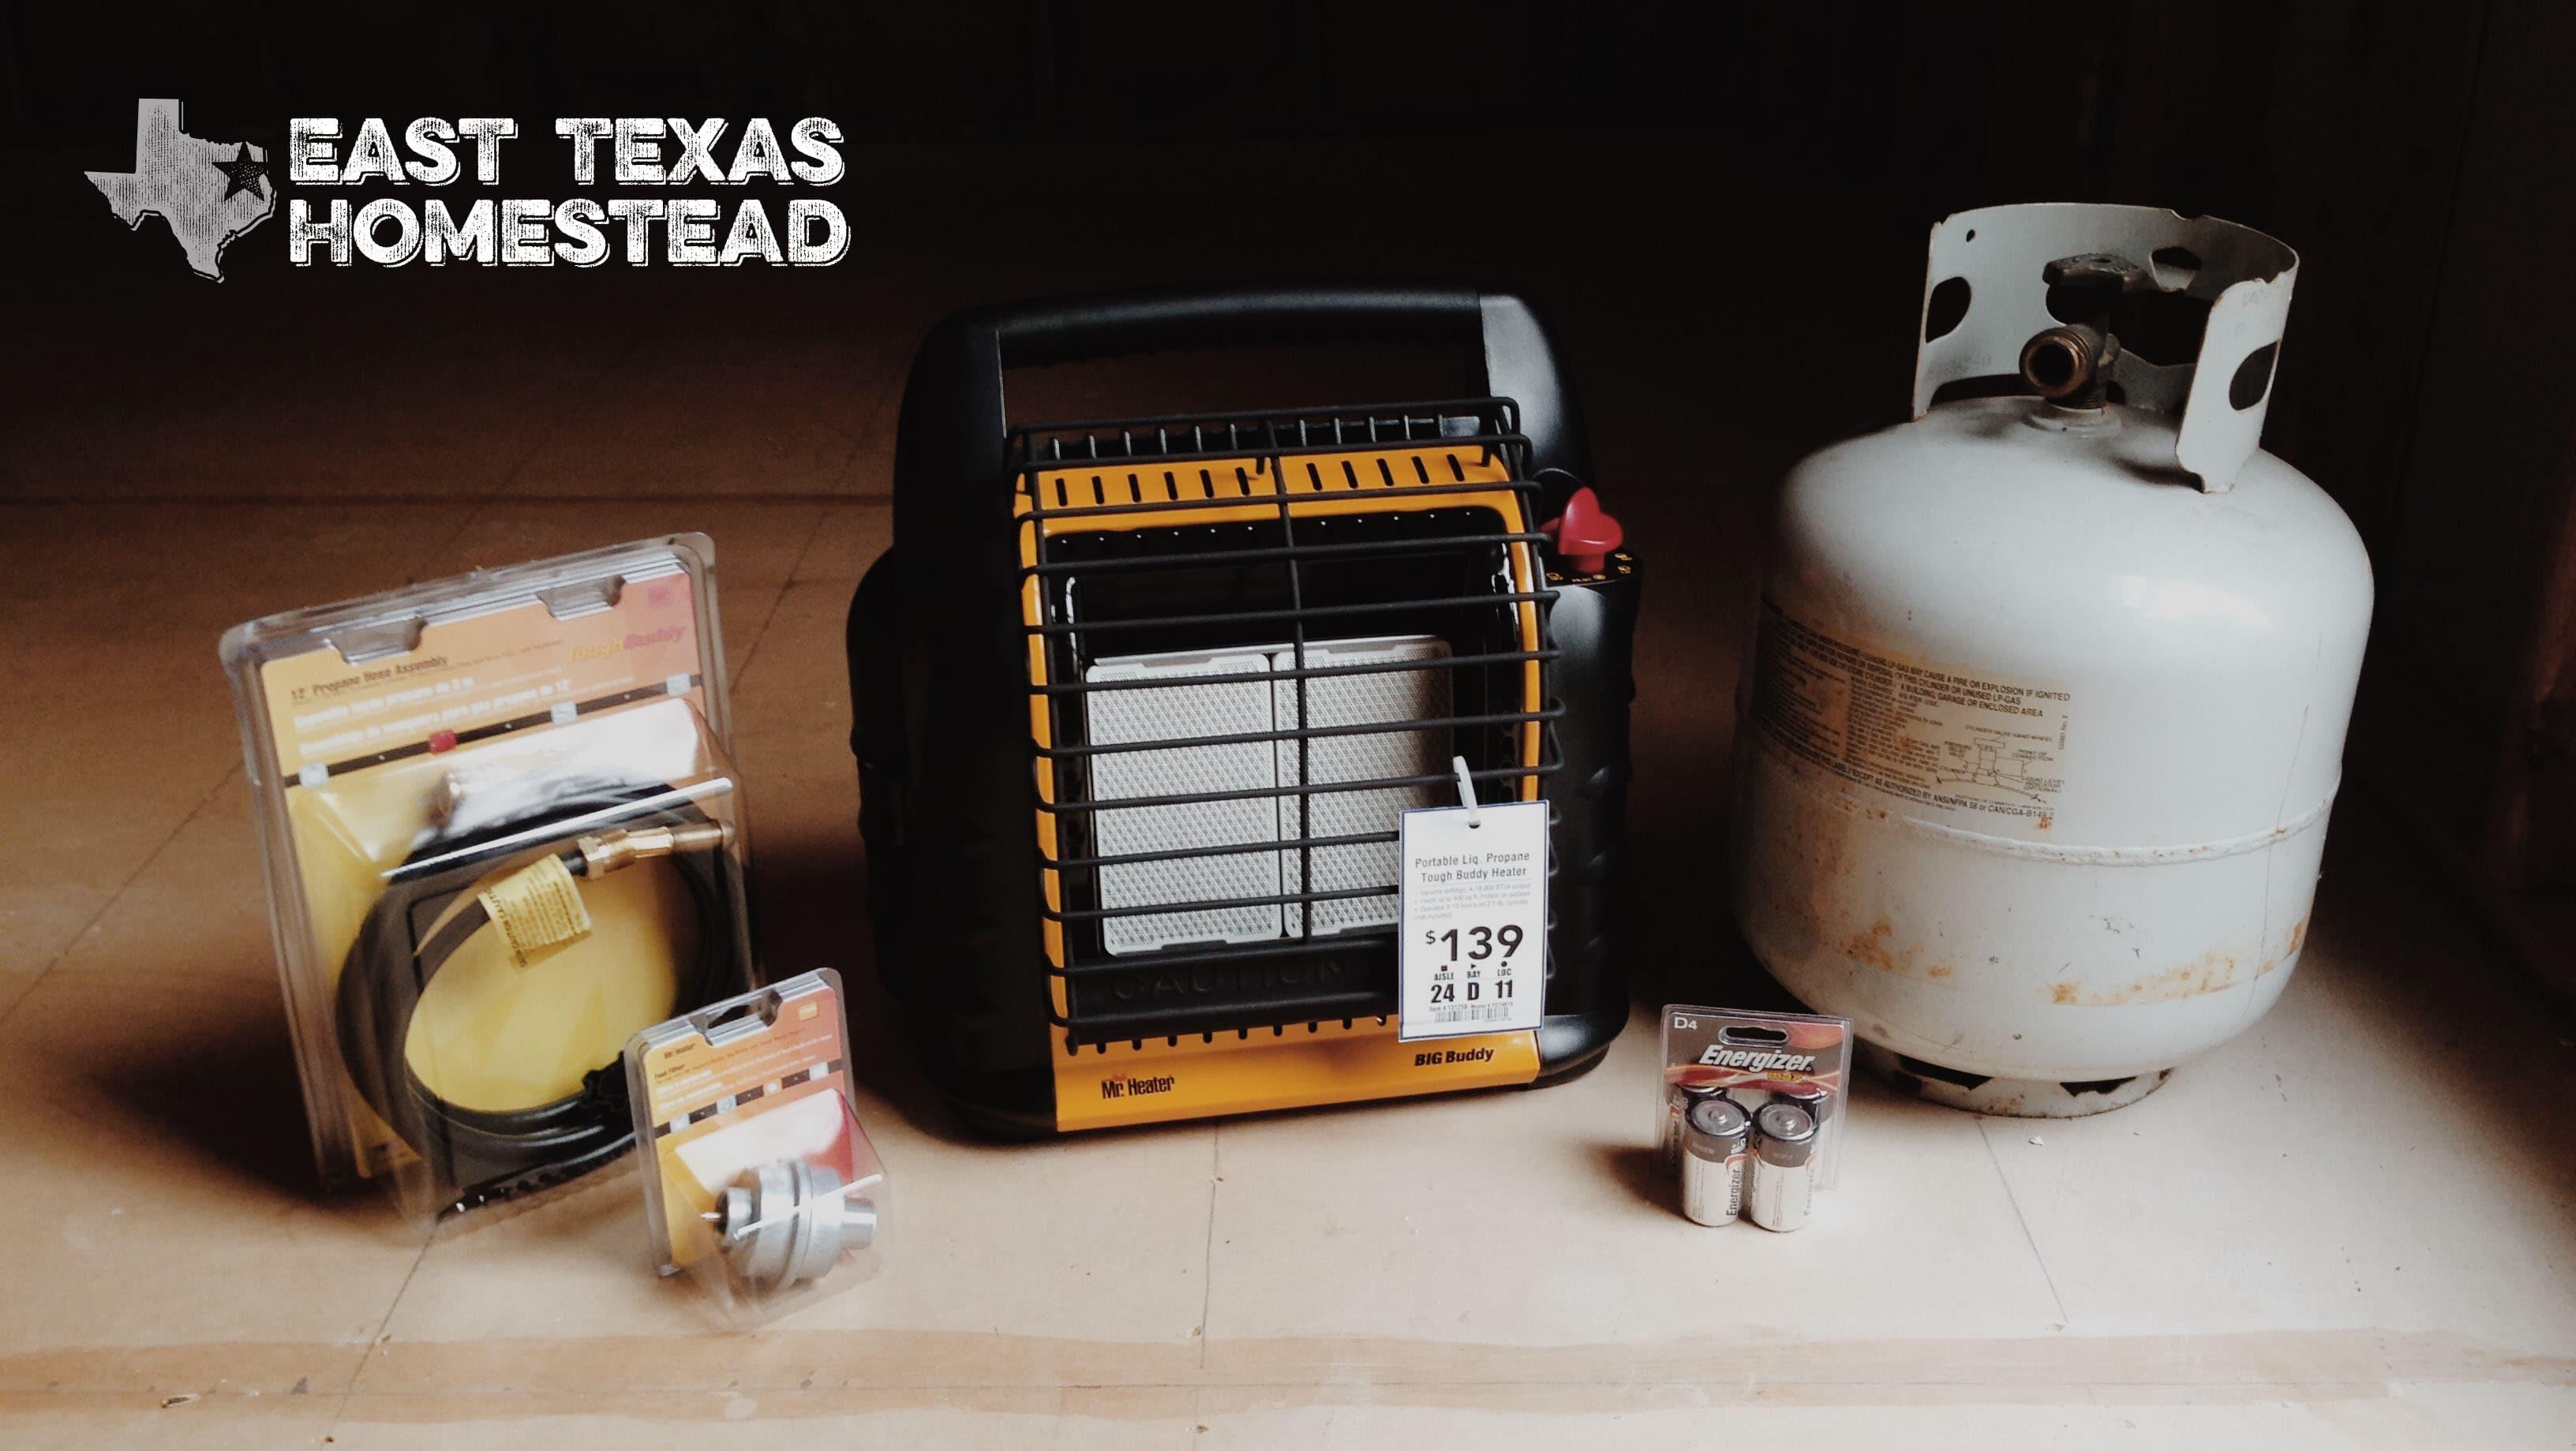 Mr. Heater - Big Buddy with 20 pound propane tank